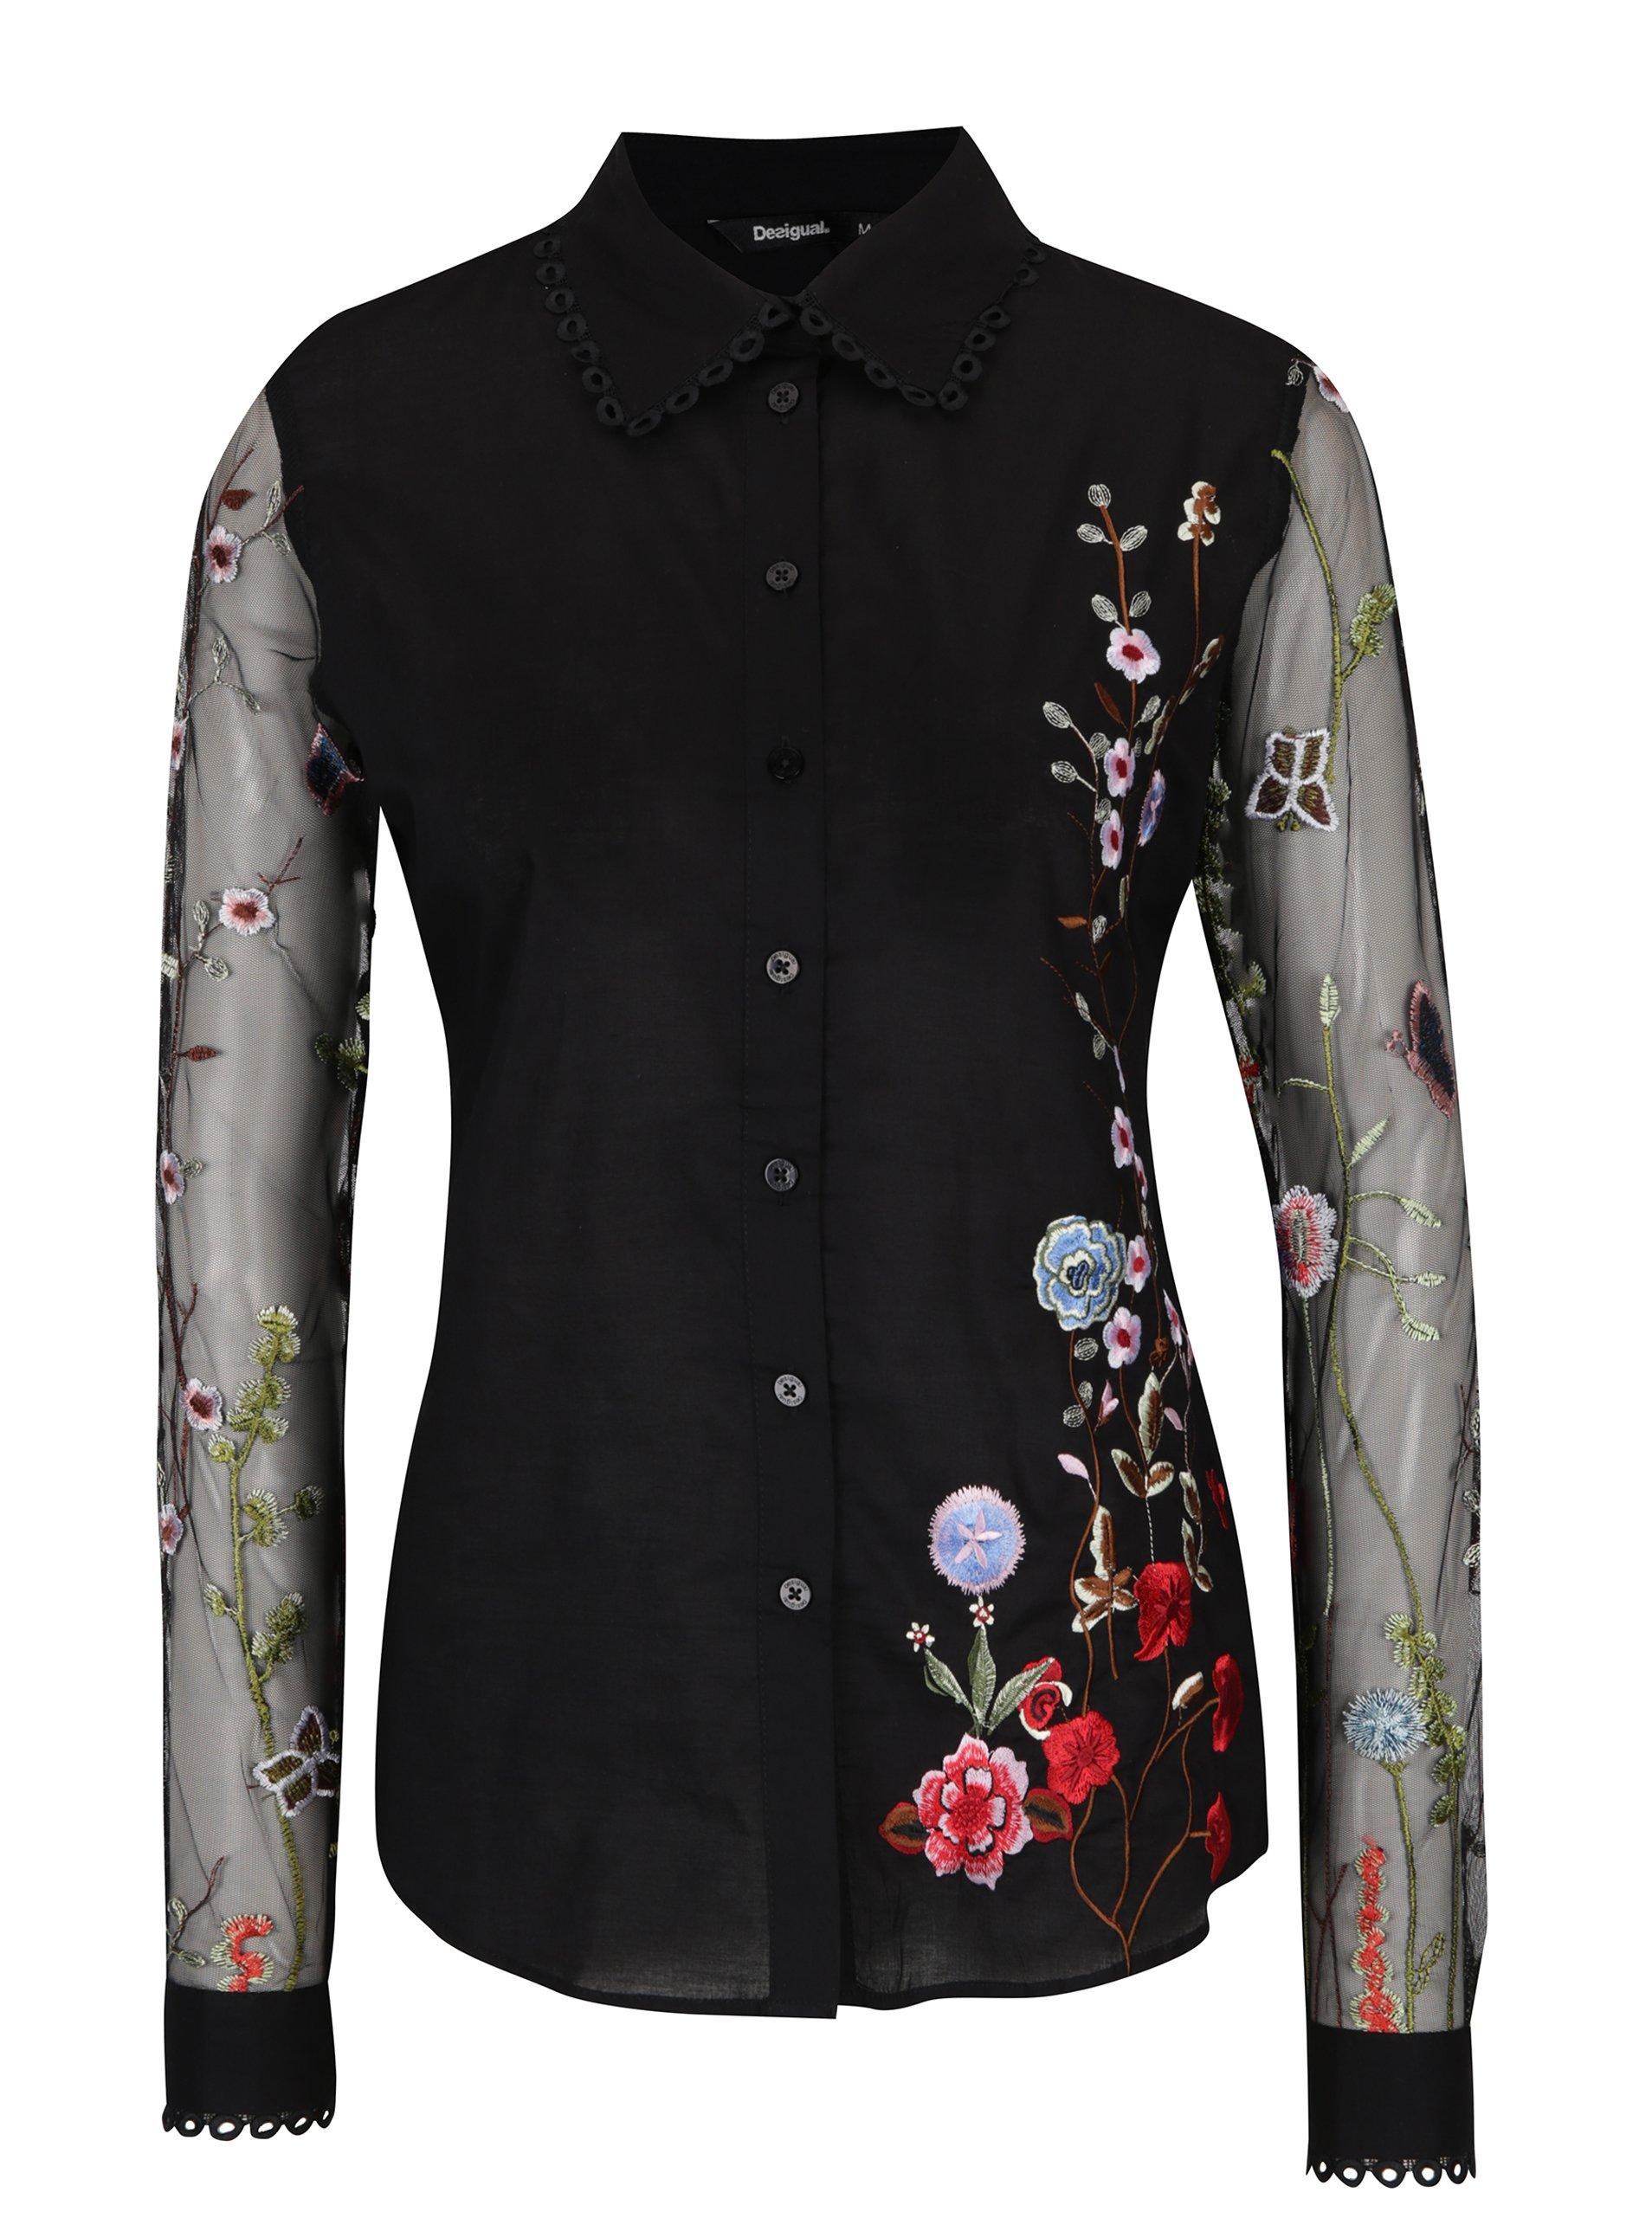 Černá košile s průsvitnými rukávy a výšivkami Desigual Florinda